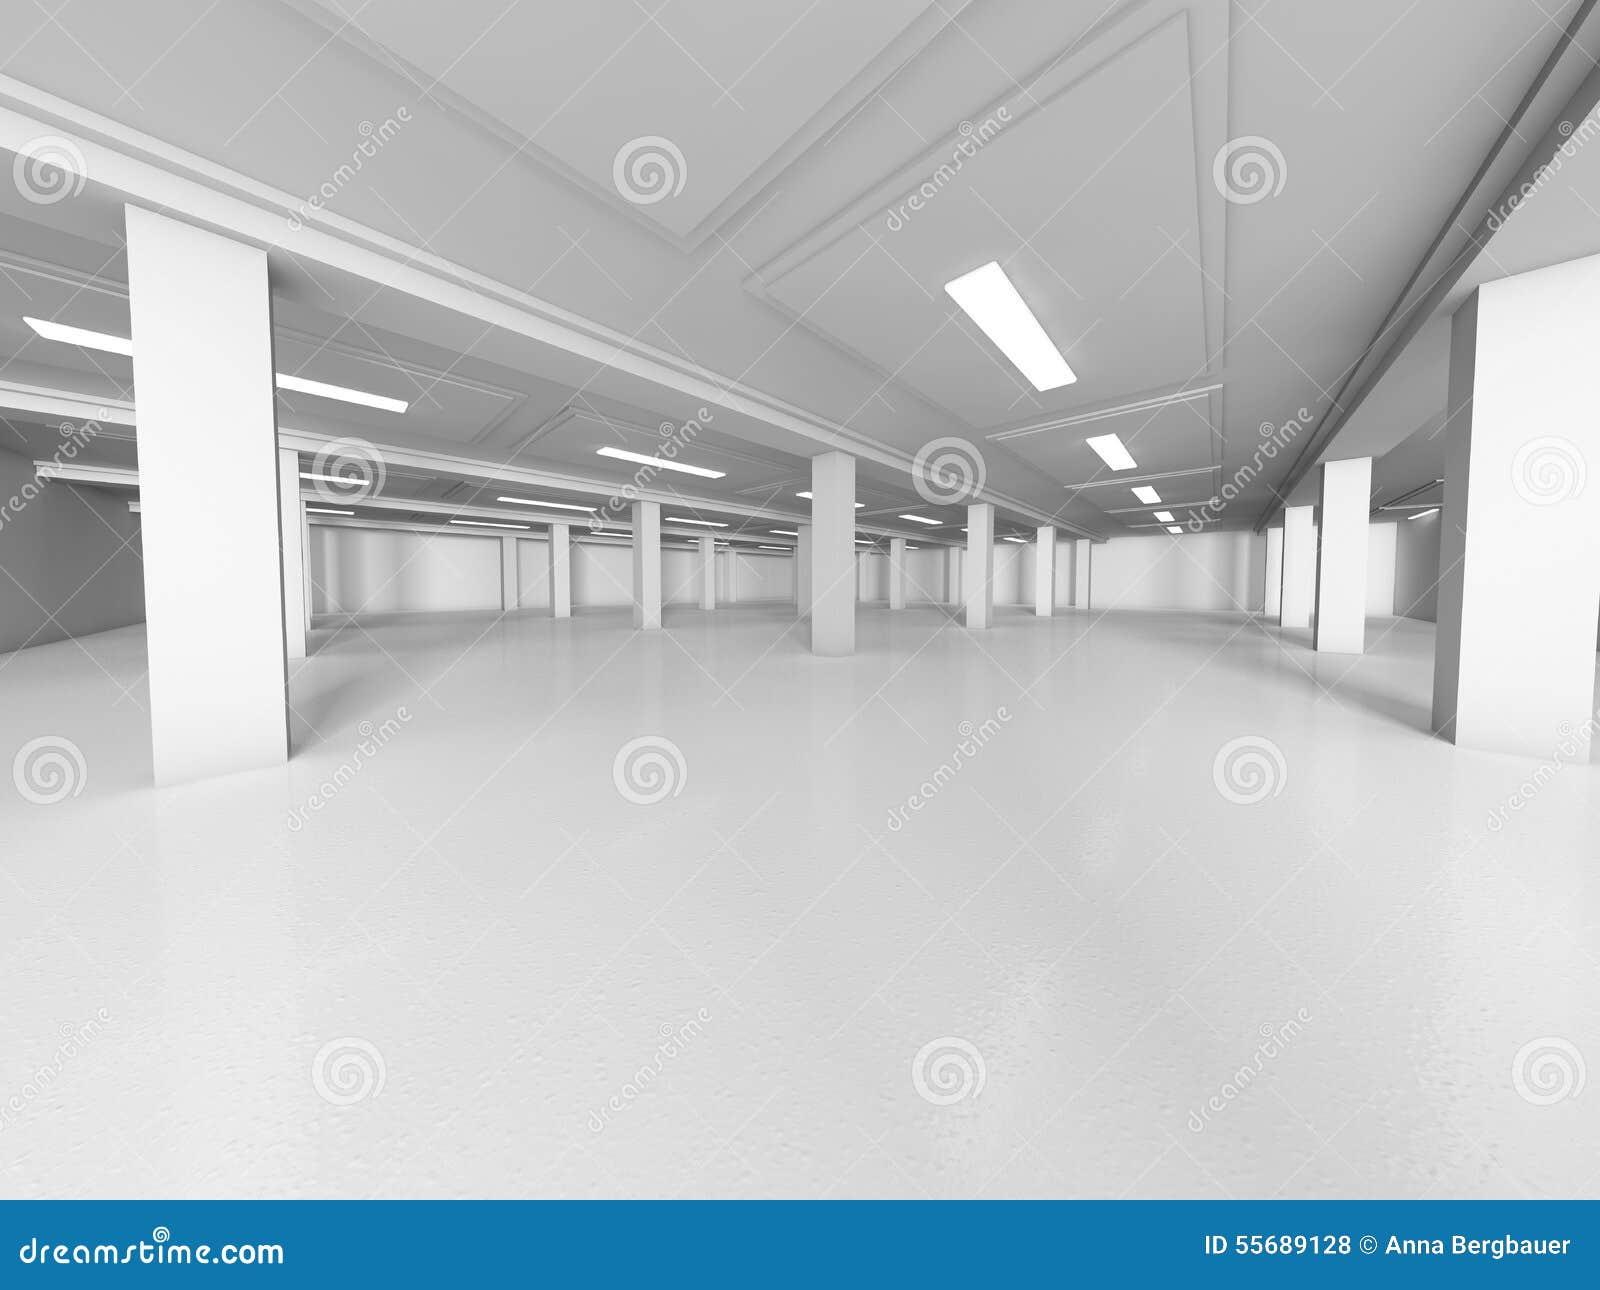 Excellent Empty Showroom 3D Rendering Stock Photo Image Of Design Download Free Architecture Designs Scobabritishbridgeorg